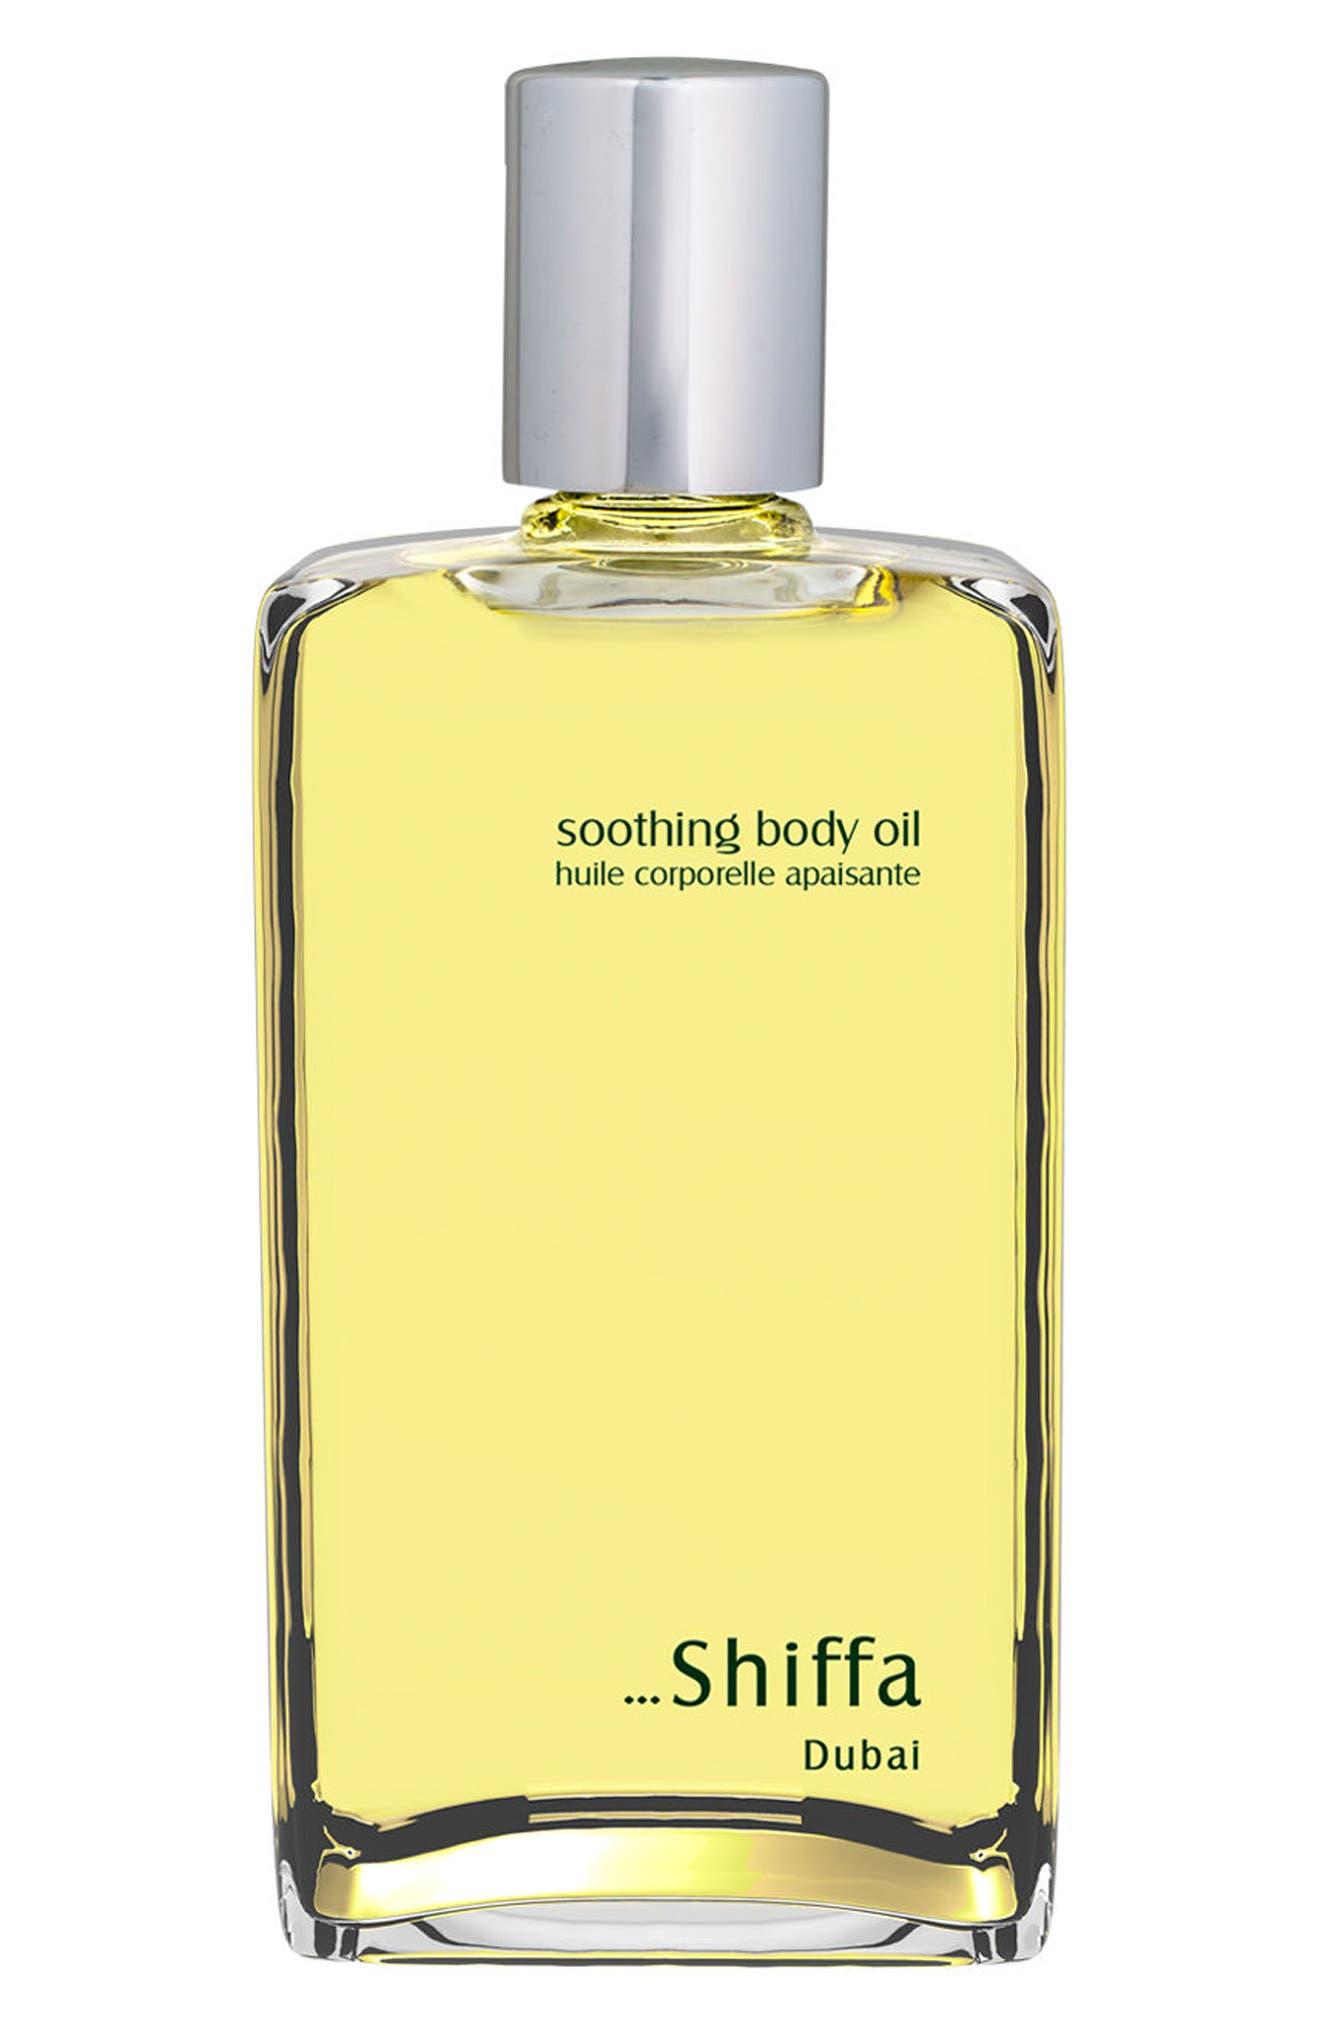 Main Image - Shiffa Soothing Body Oil